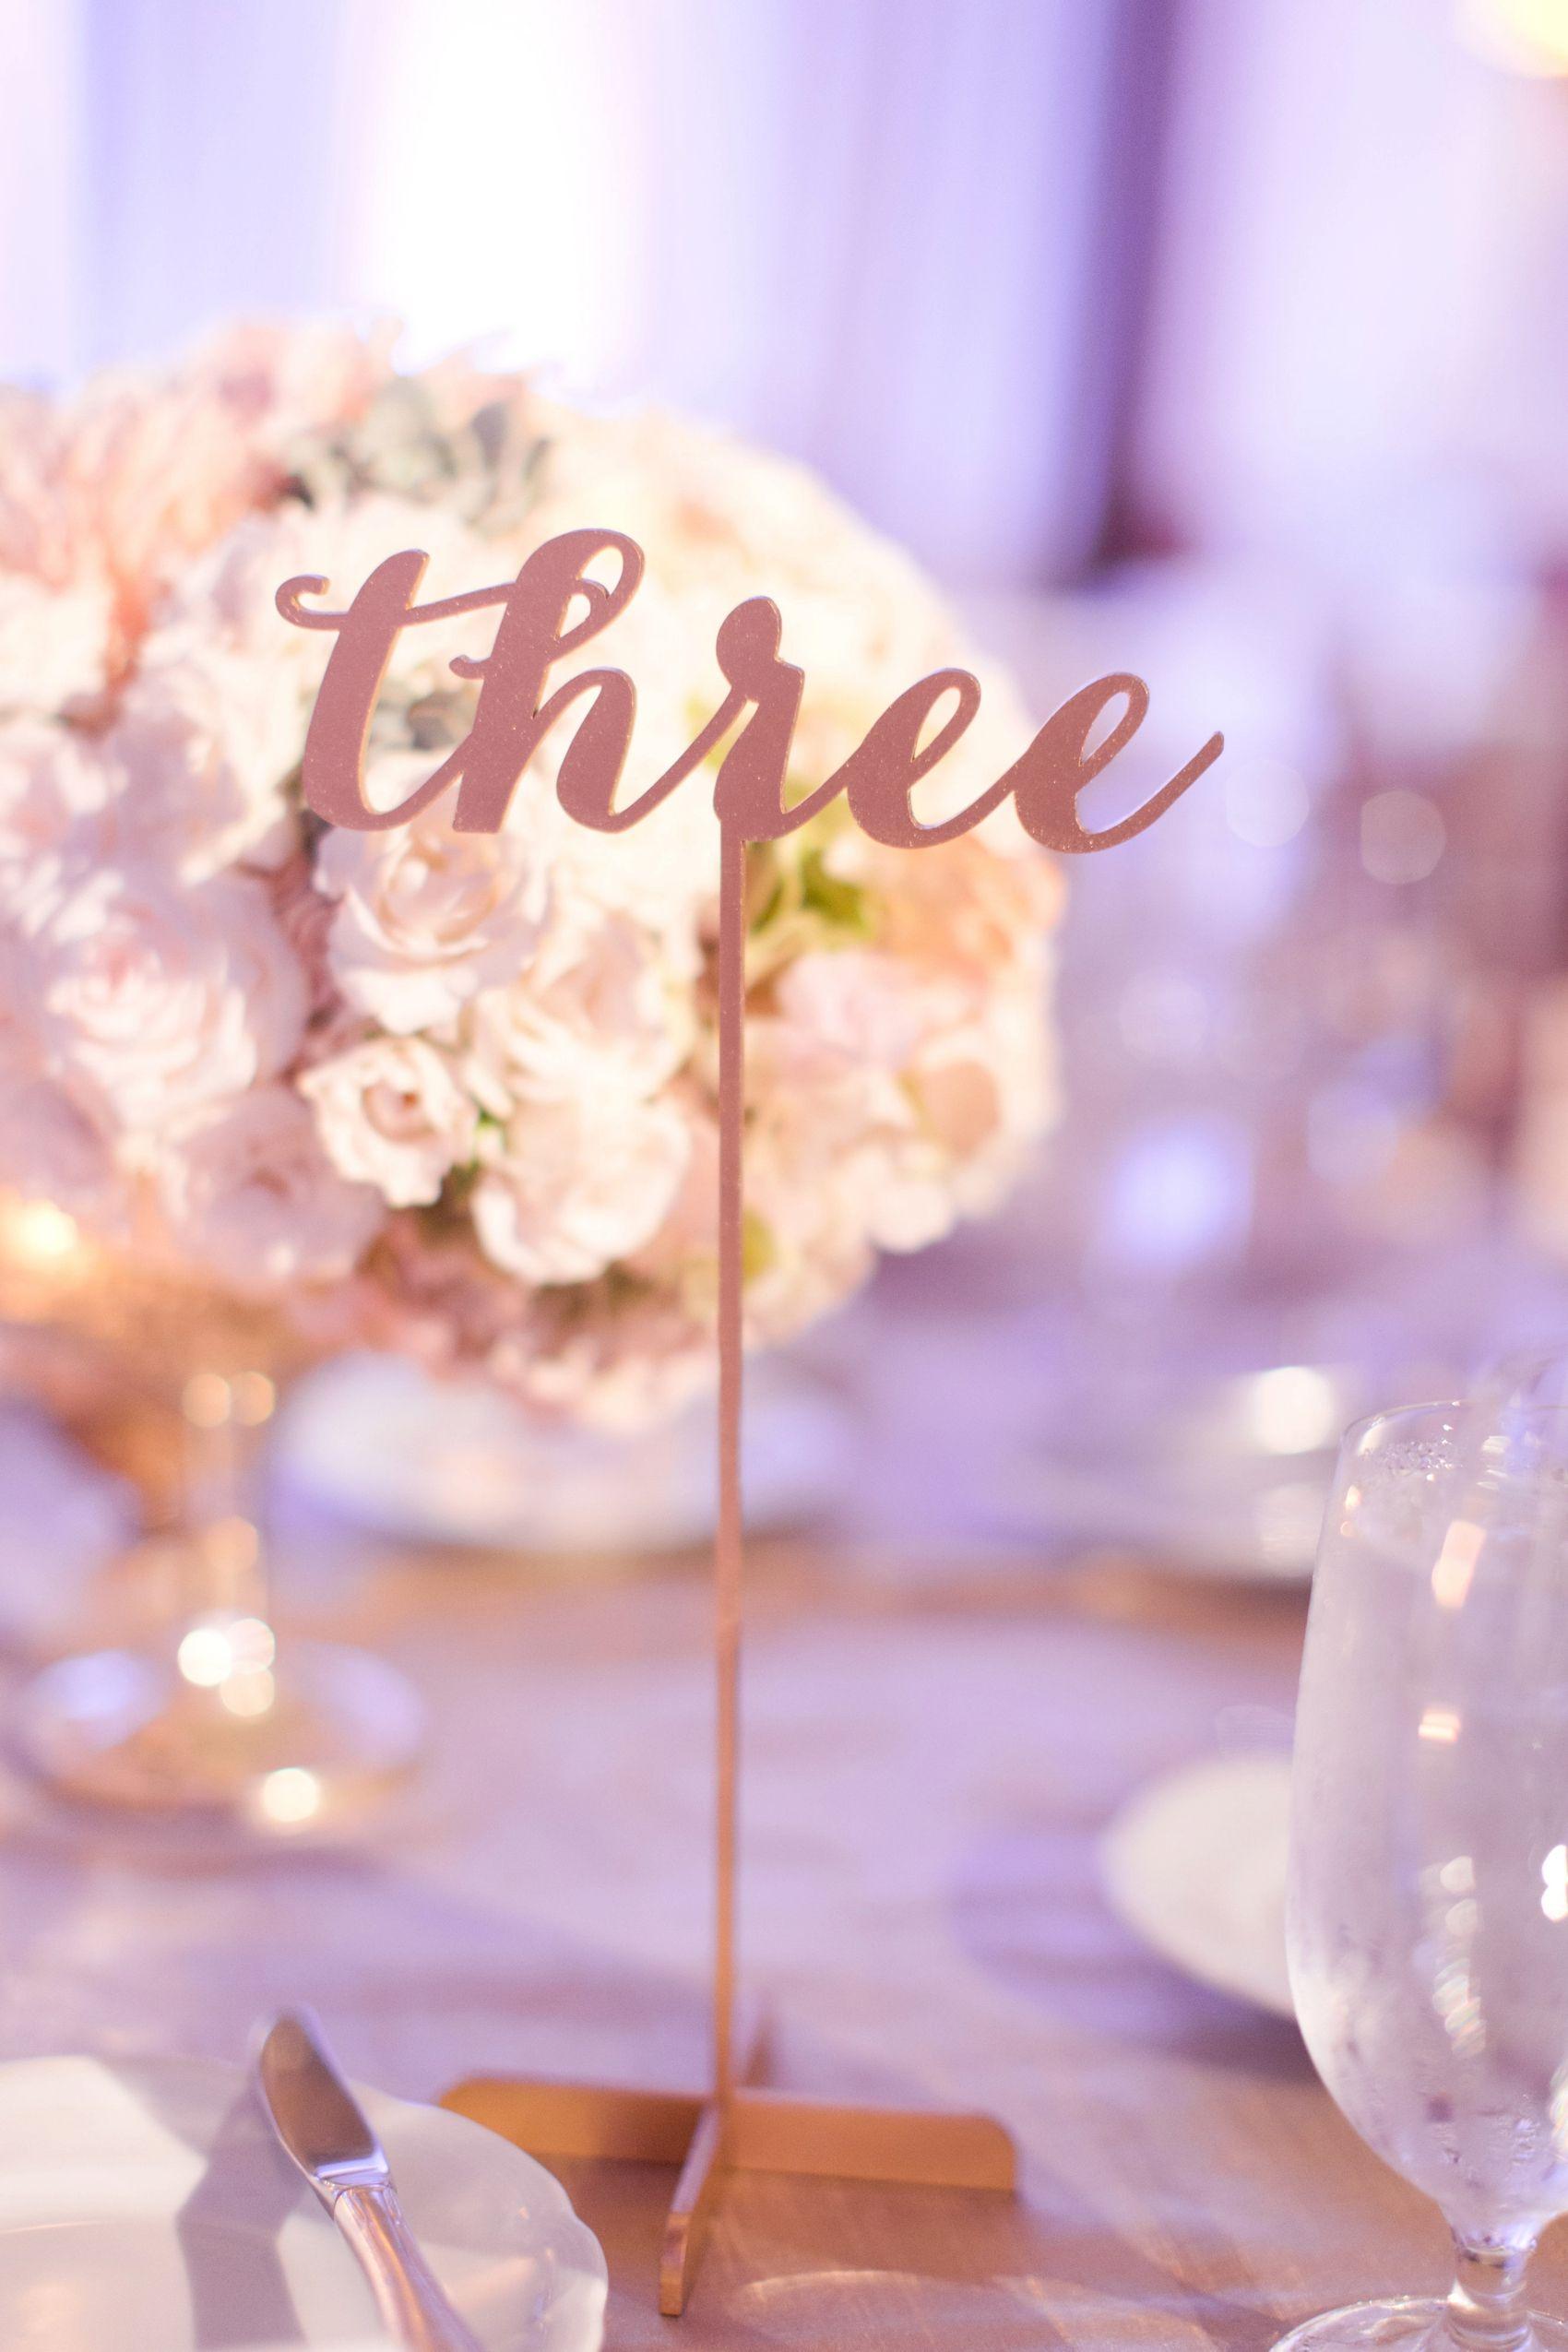 See through corset wedding dresses  romantic Four Seasons Scottsdale Wedding  Corset wedding dresses